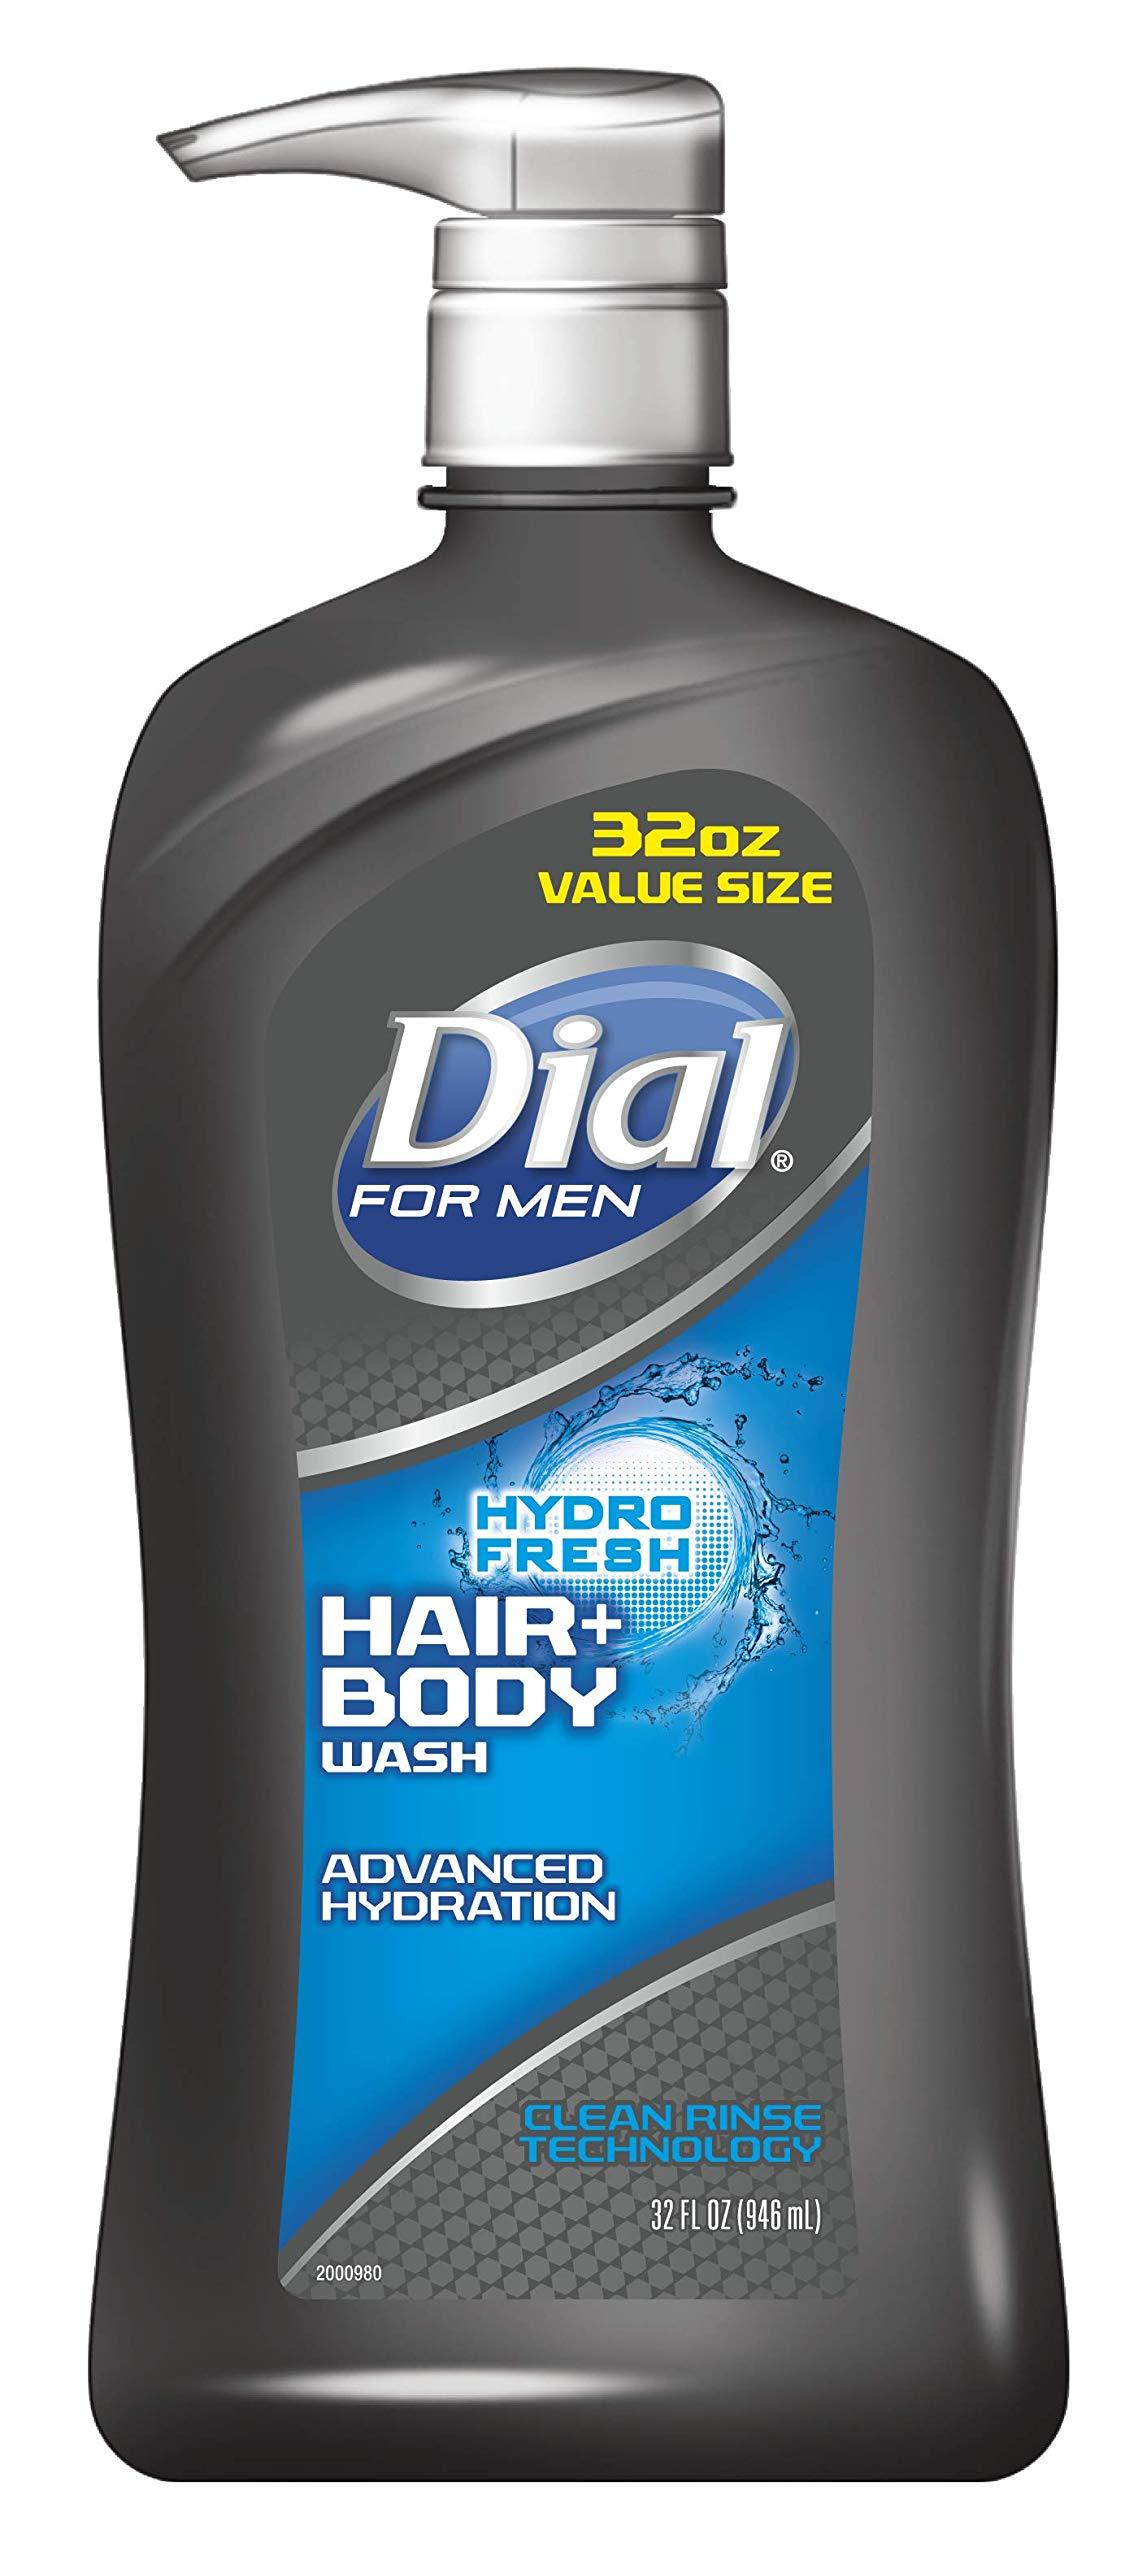 Dial for Men Hair + Body Wash, Hydro Fresh, 32 Ounce